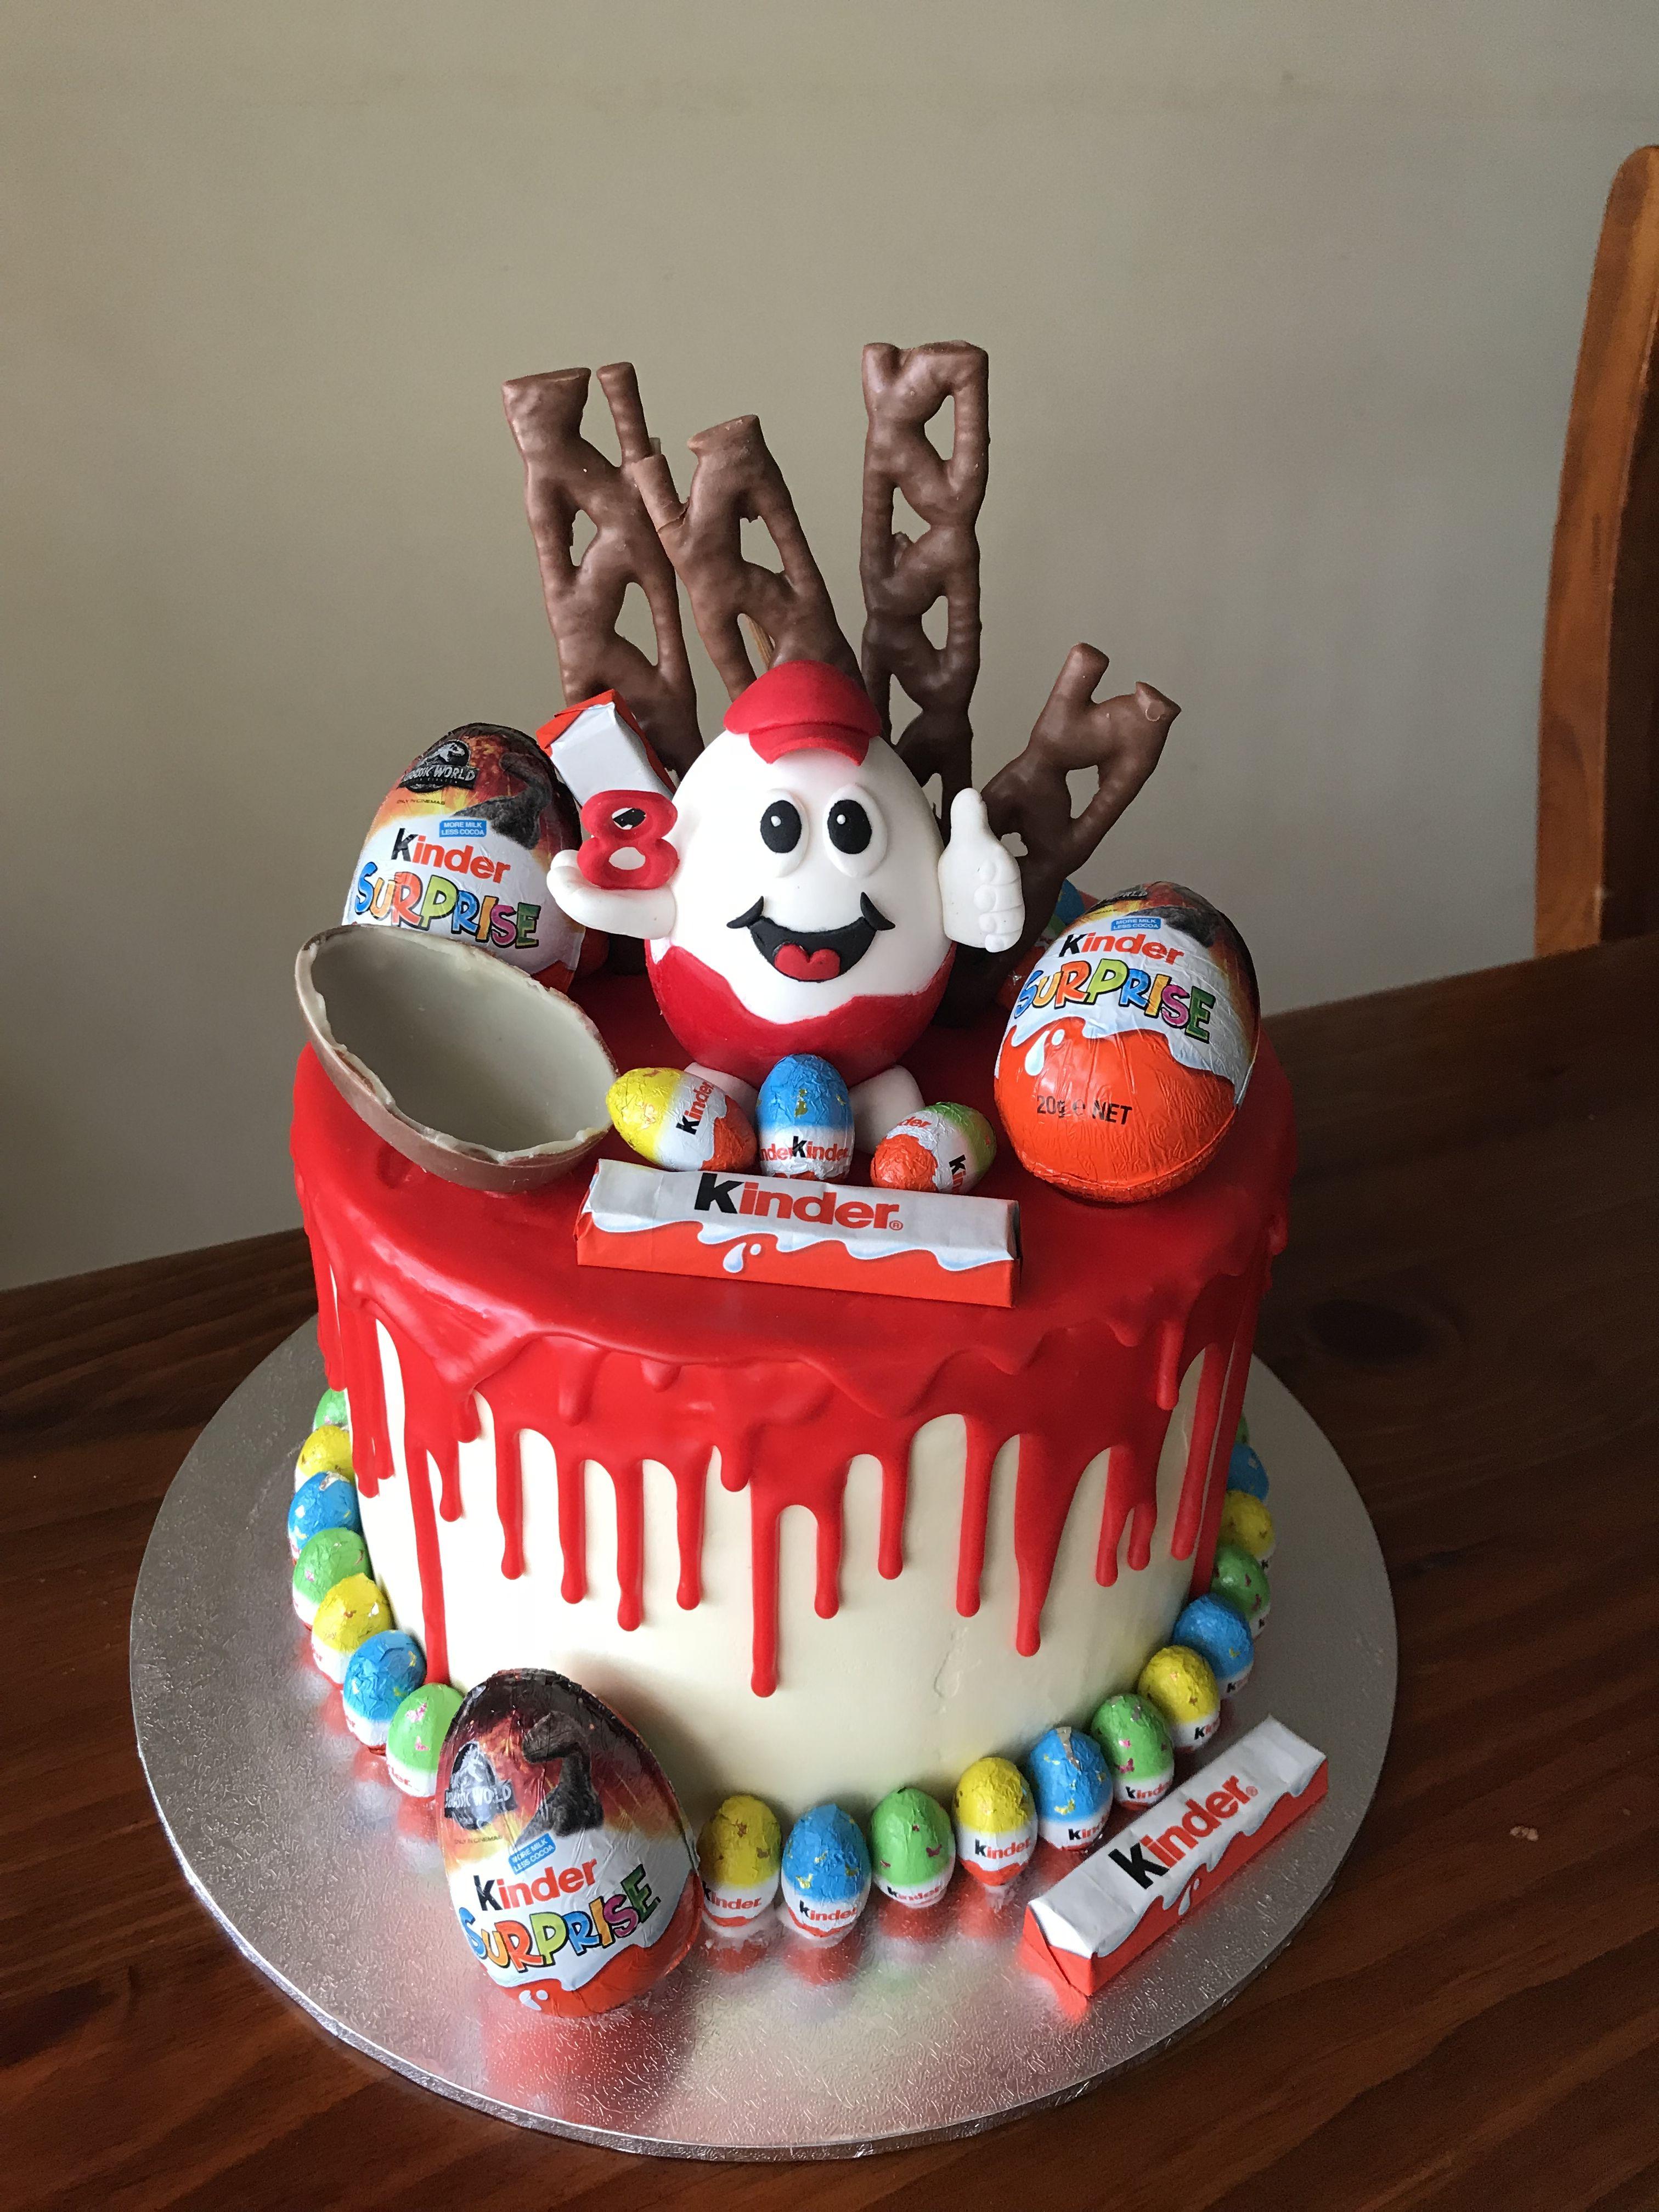 Kinder Surprise Drip Cake Tropfkuchen Geschmolzene Schokolade Kinder Uberraschung